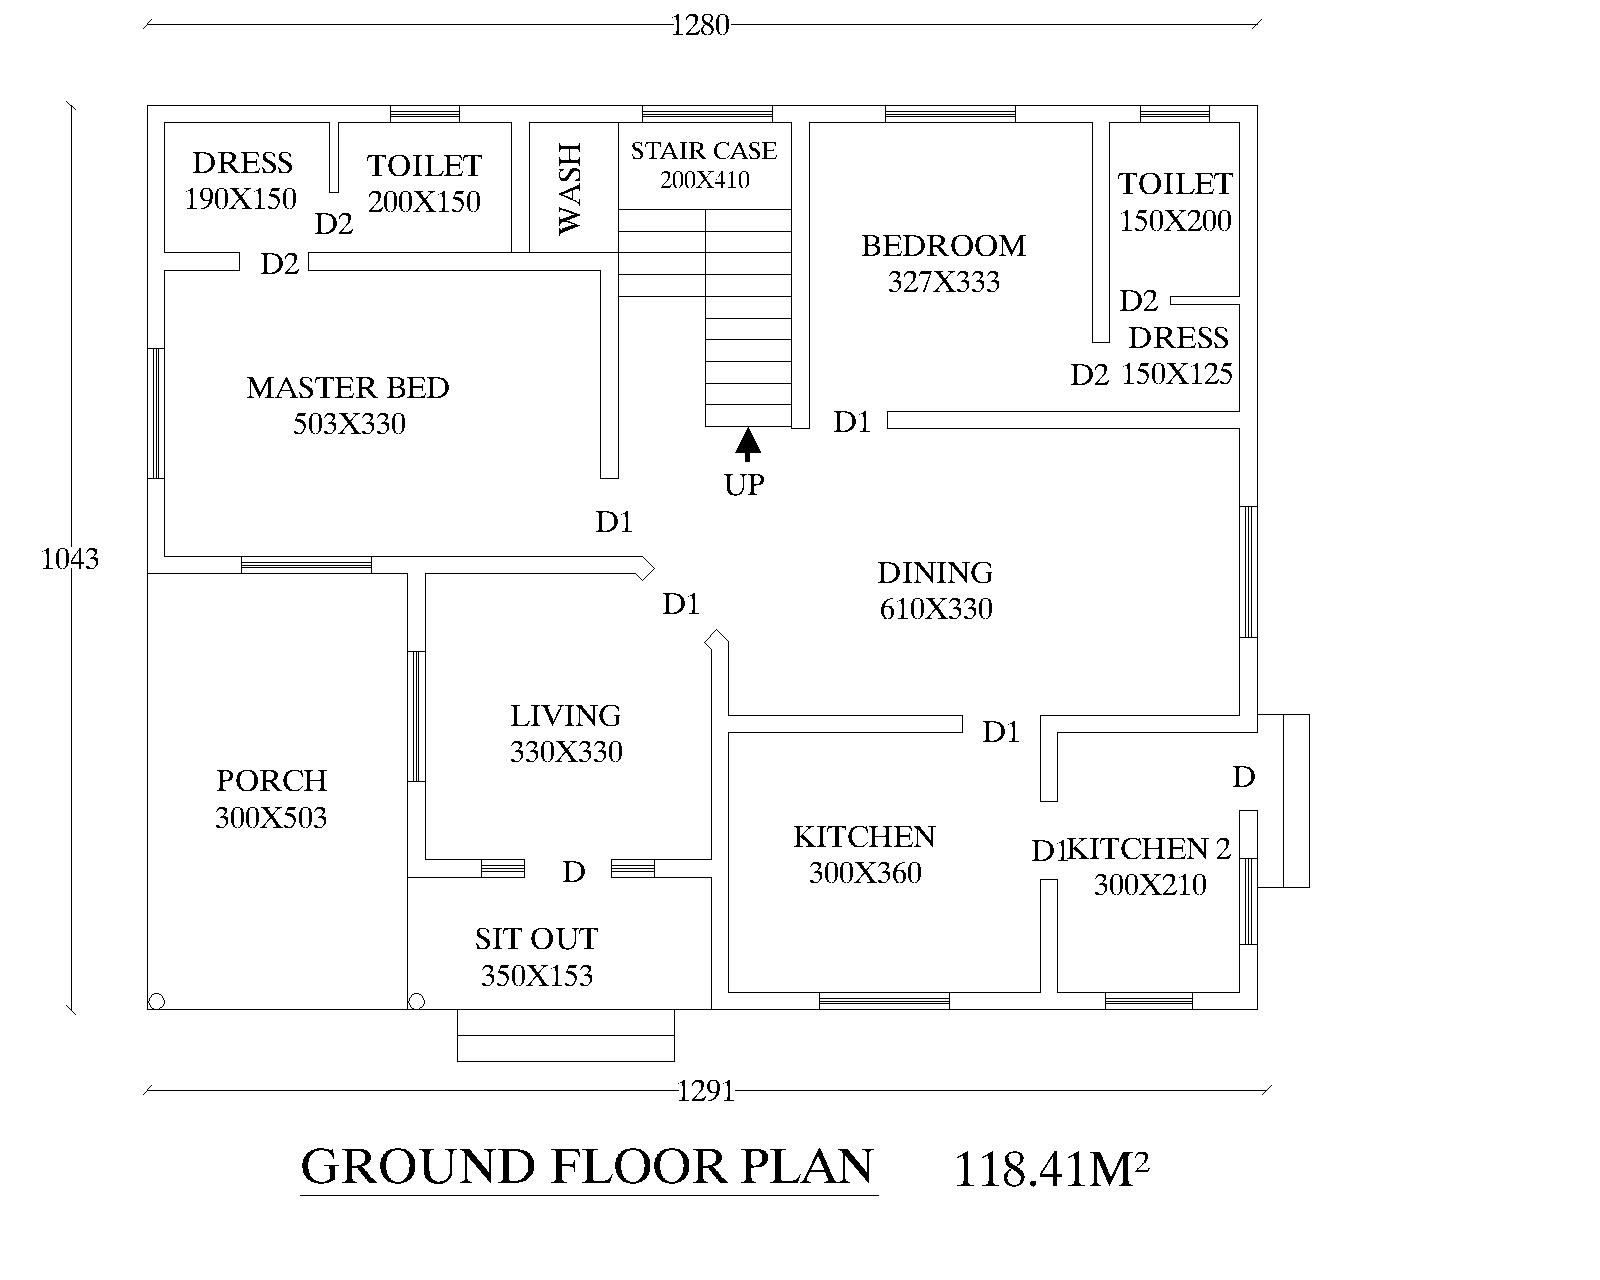 home design plans floor plan for bedroom house kerala design idea eight  bedroom floor plans furniture. Home Design Plane